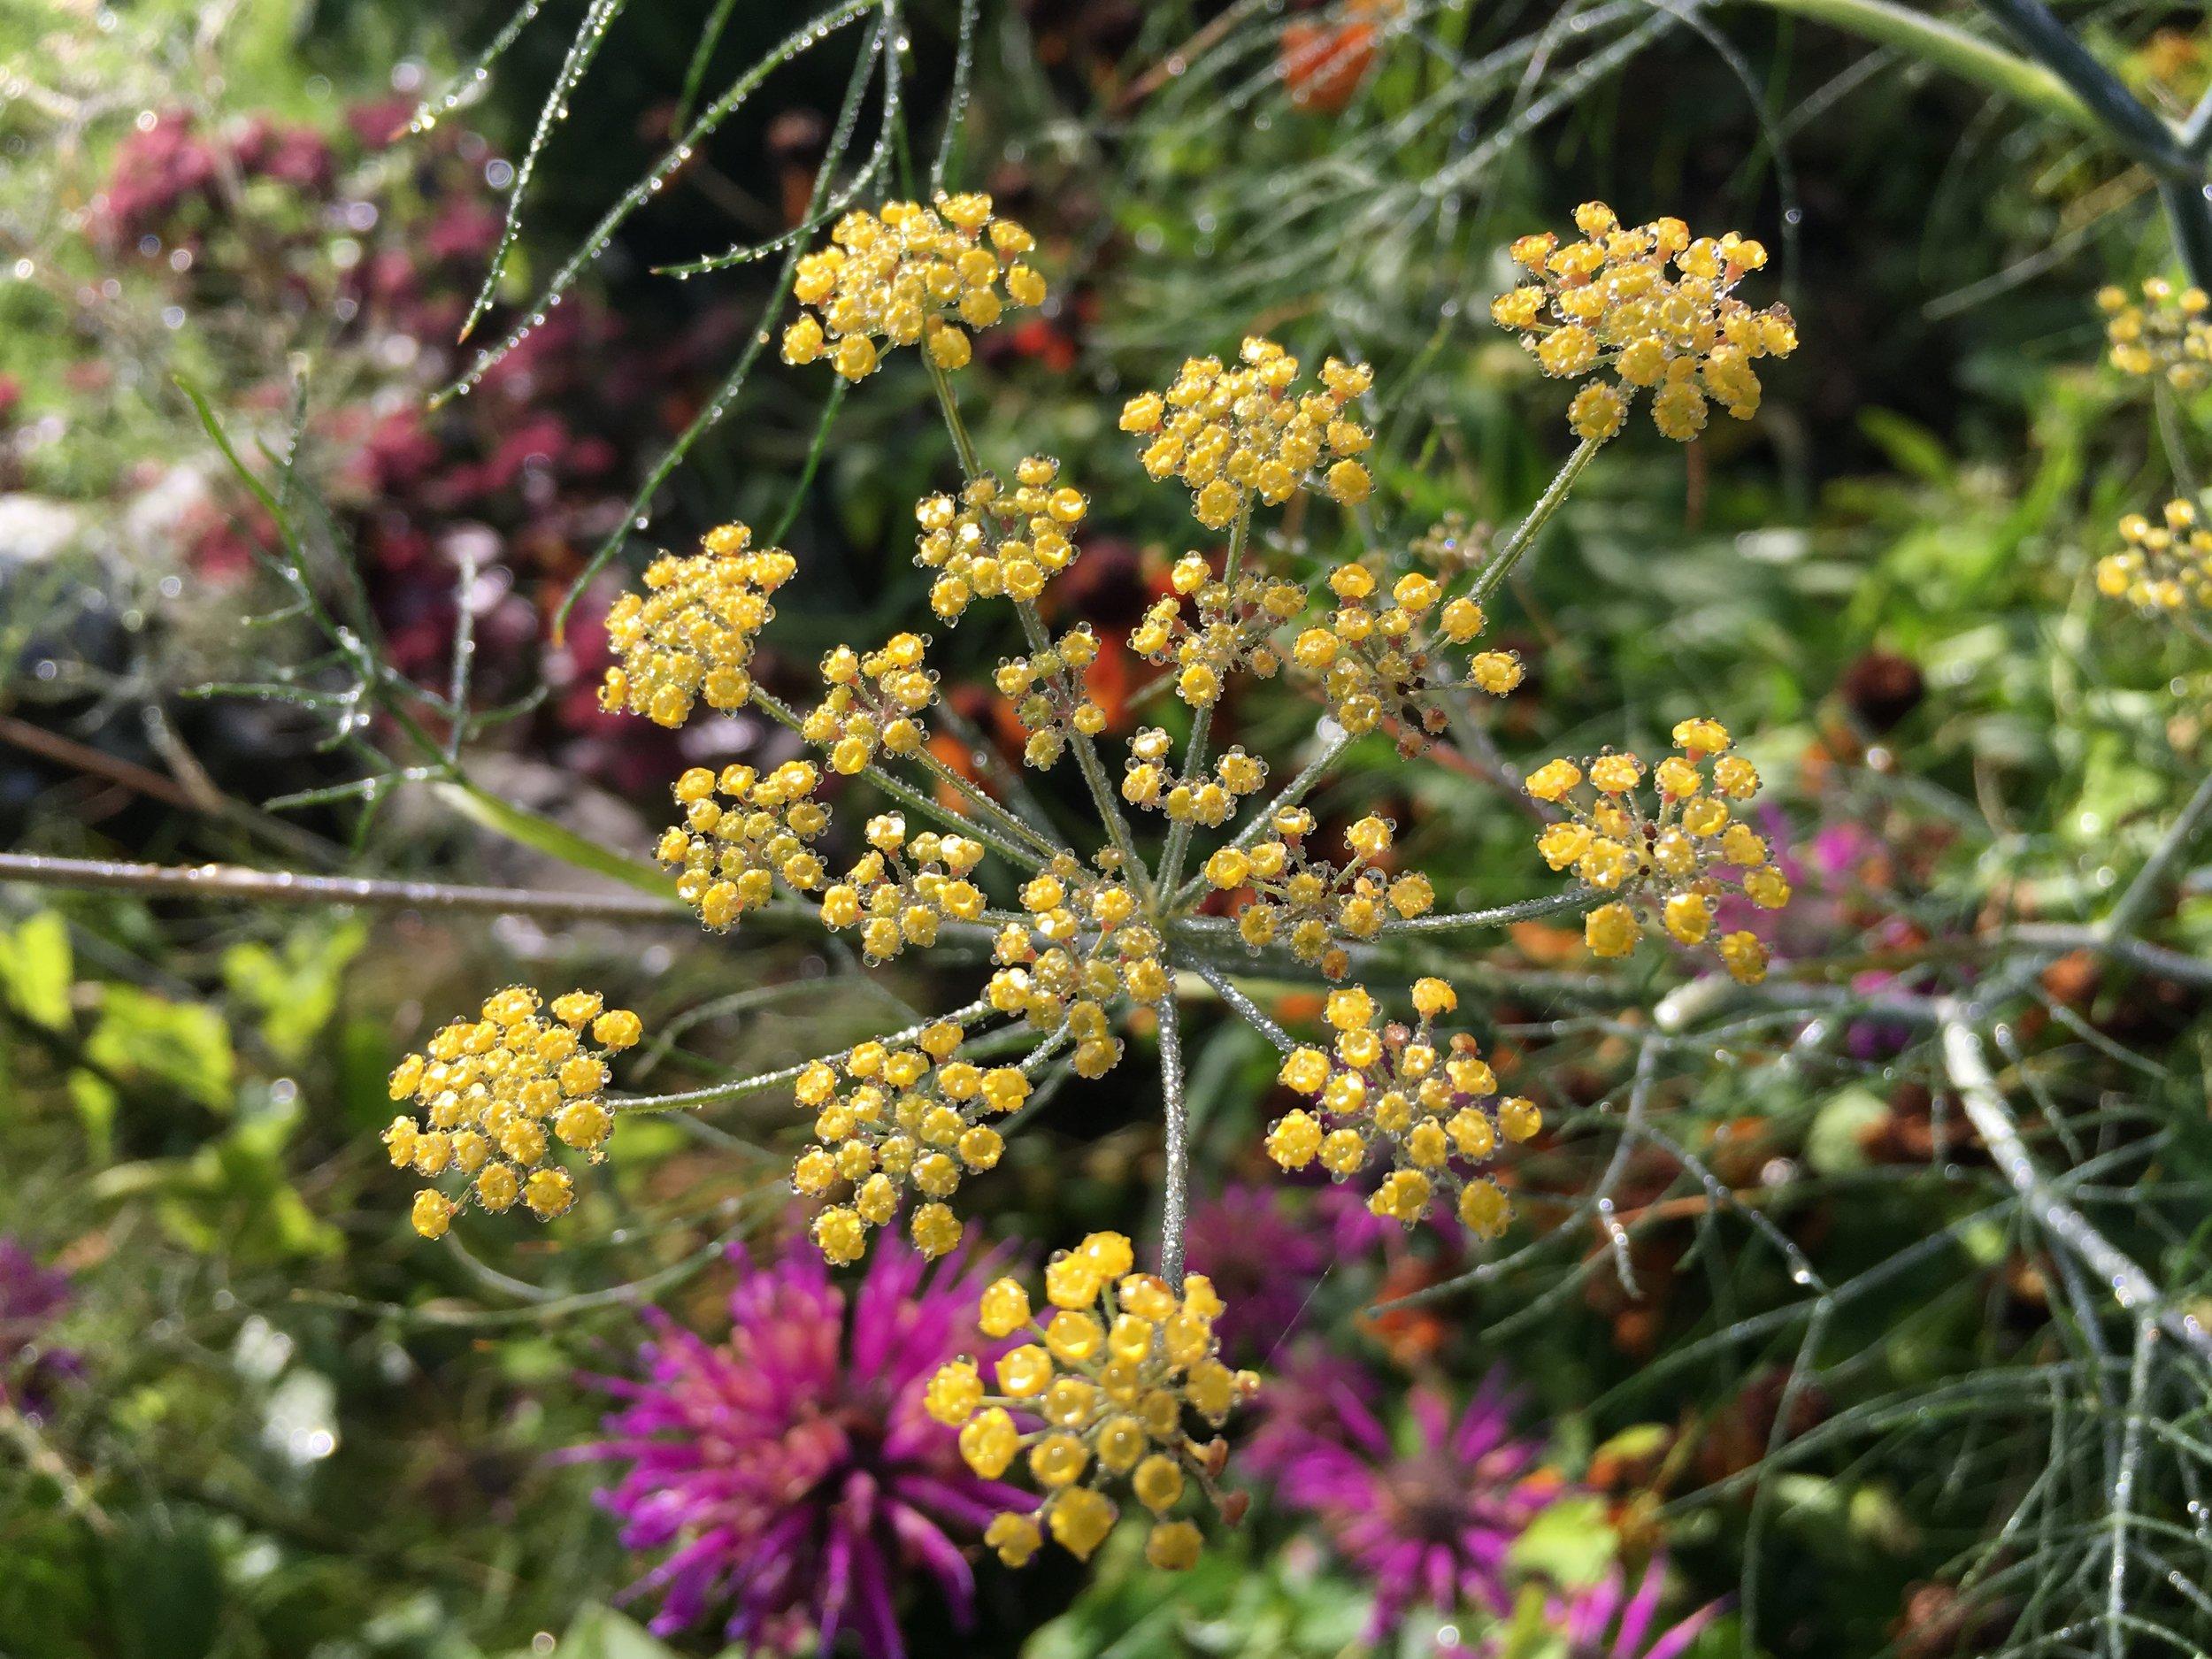 Bronzefennikels lysegule skærmblomster. På latin hedder den Foeniculum vulgare var. purpurascens.